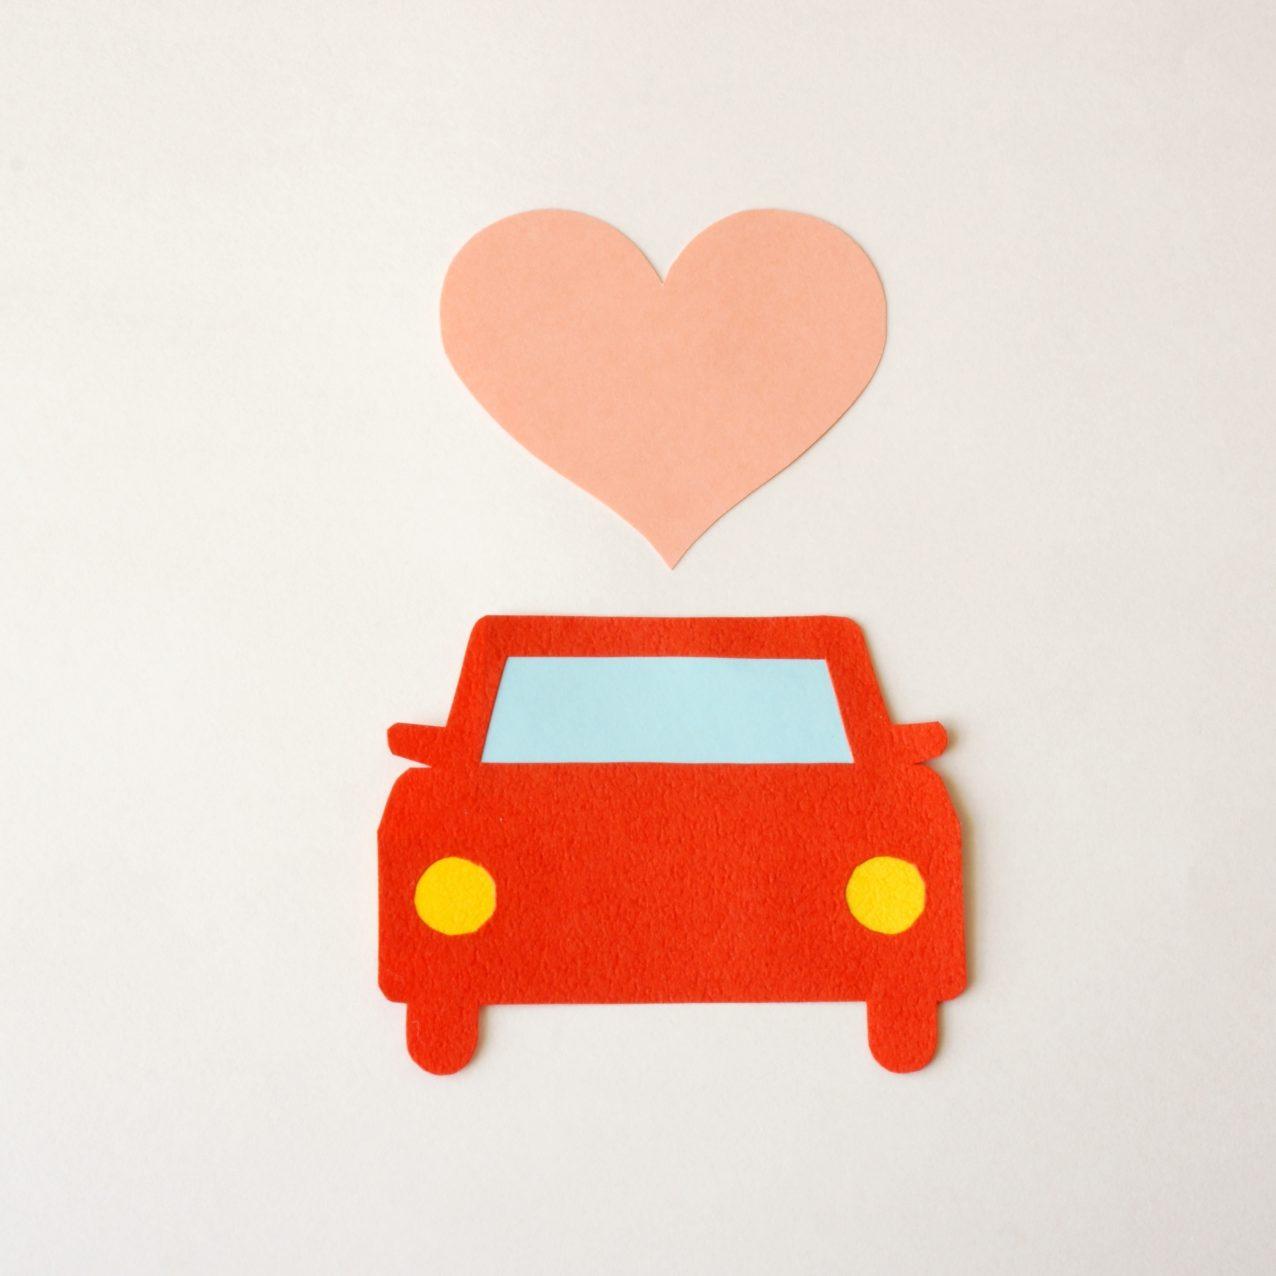 car-image8